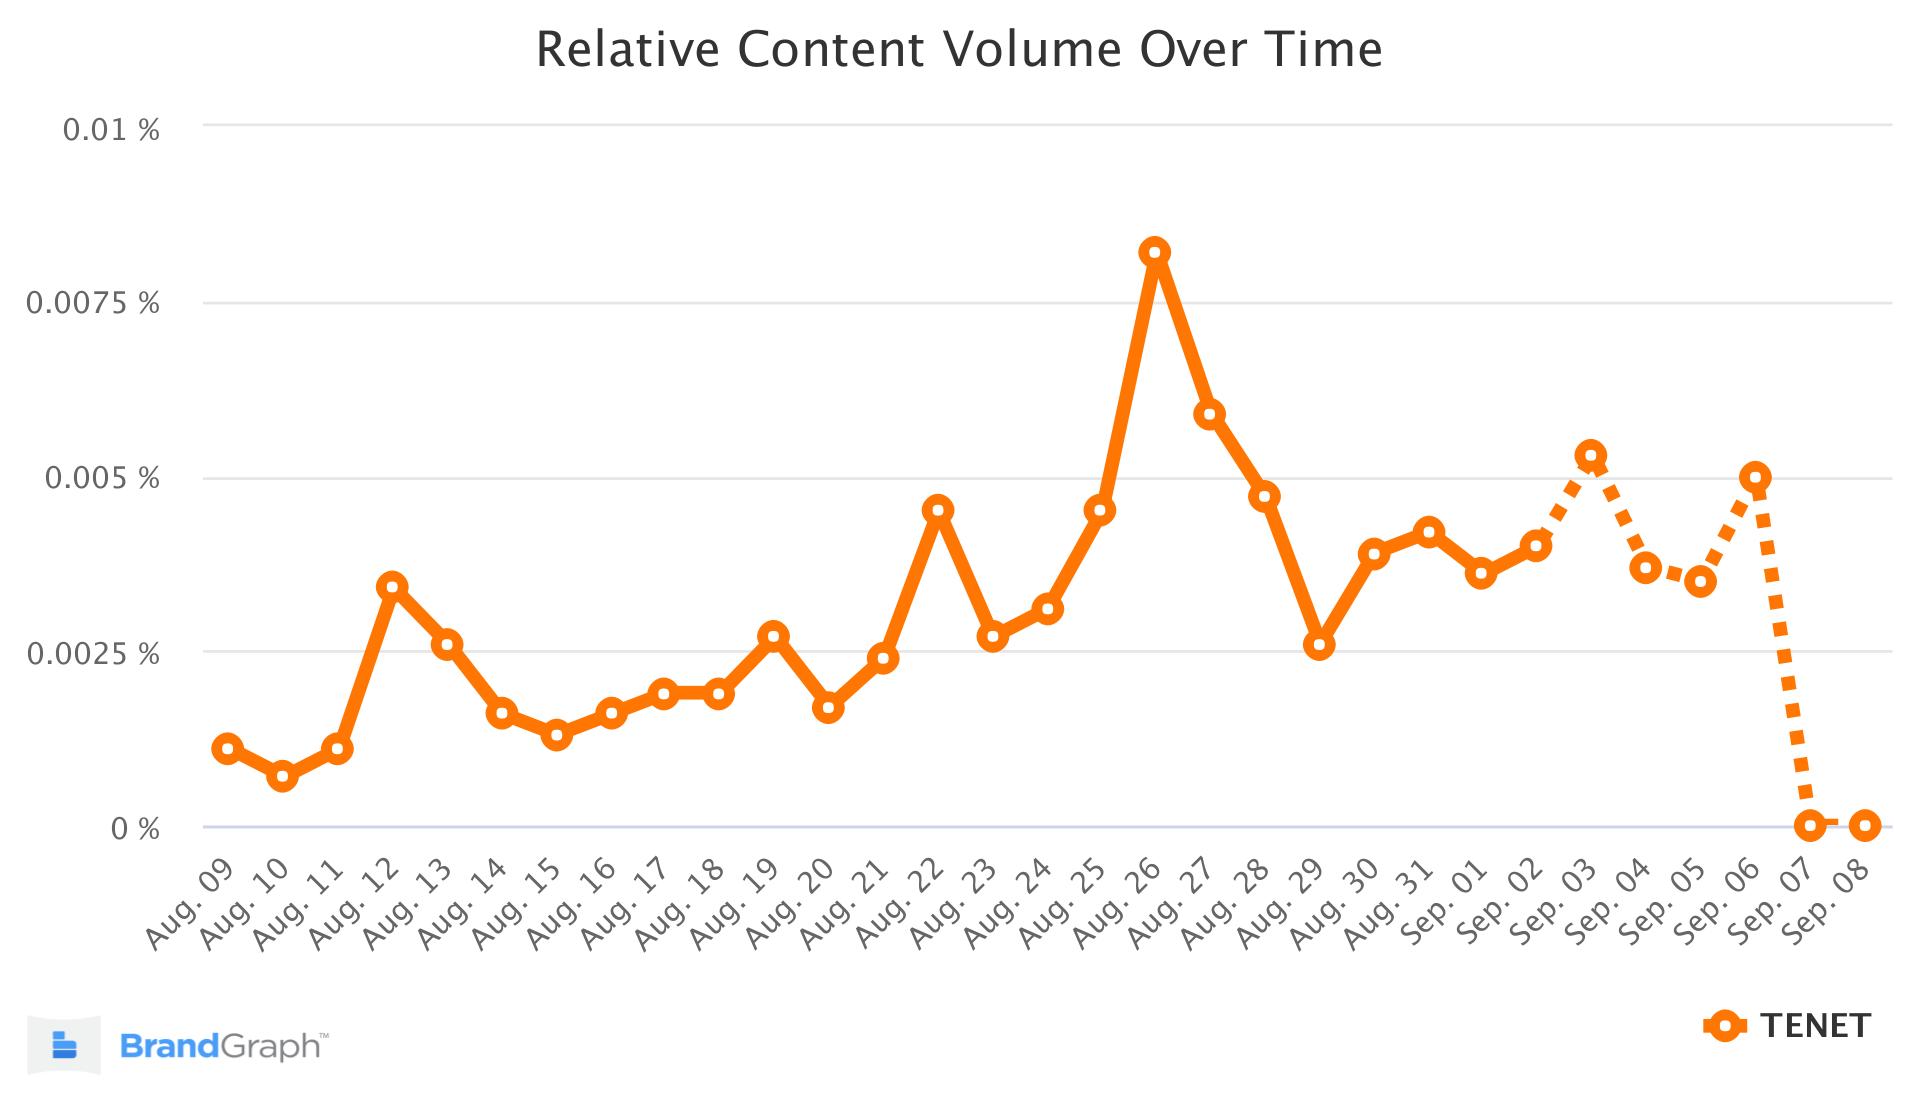 TENET brandgraph trend chart